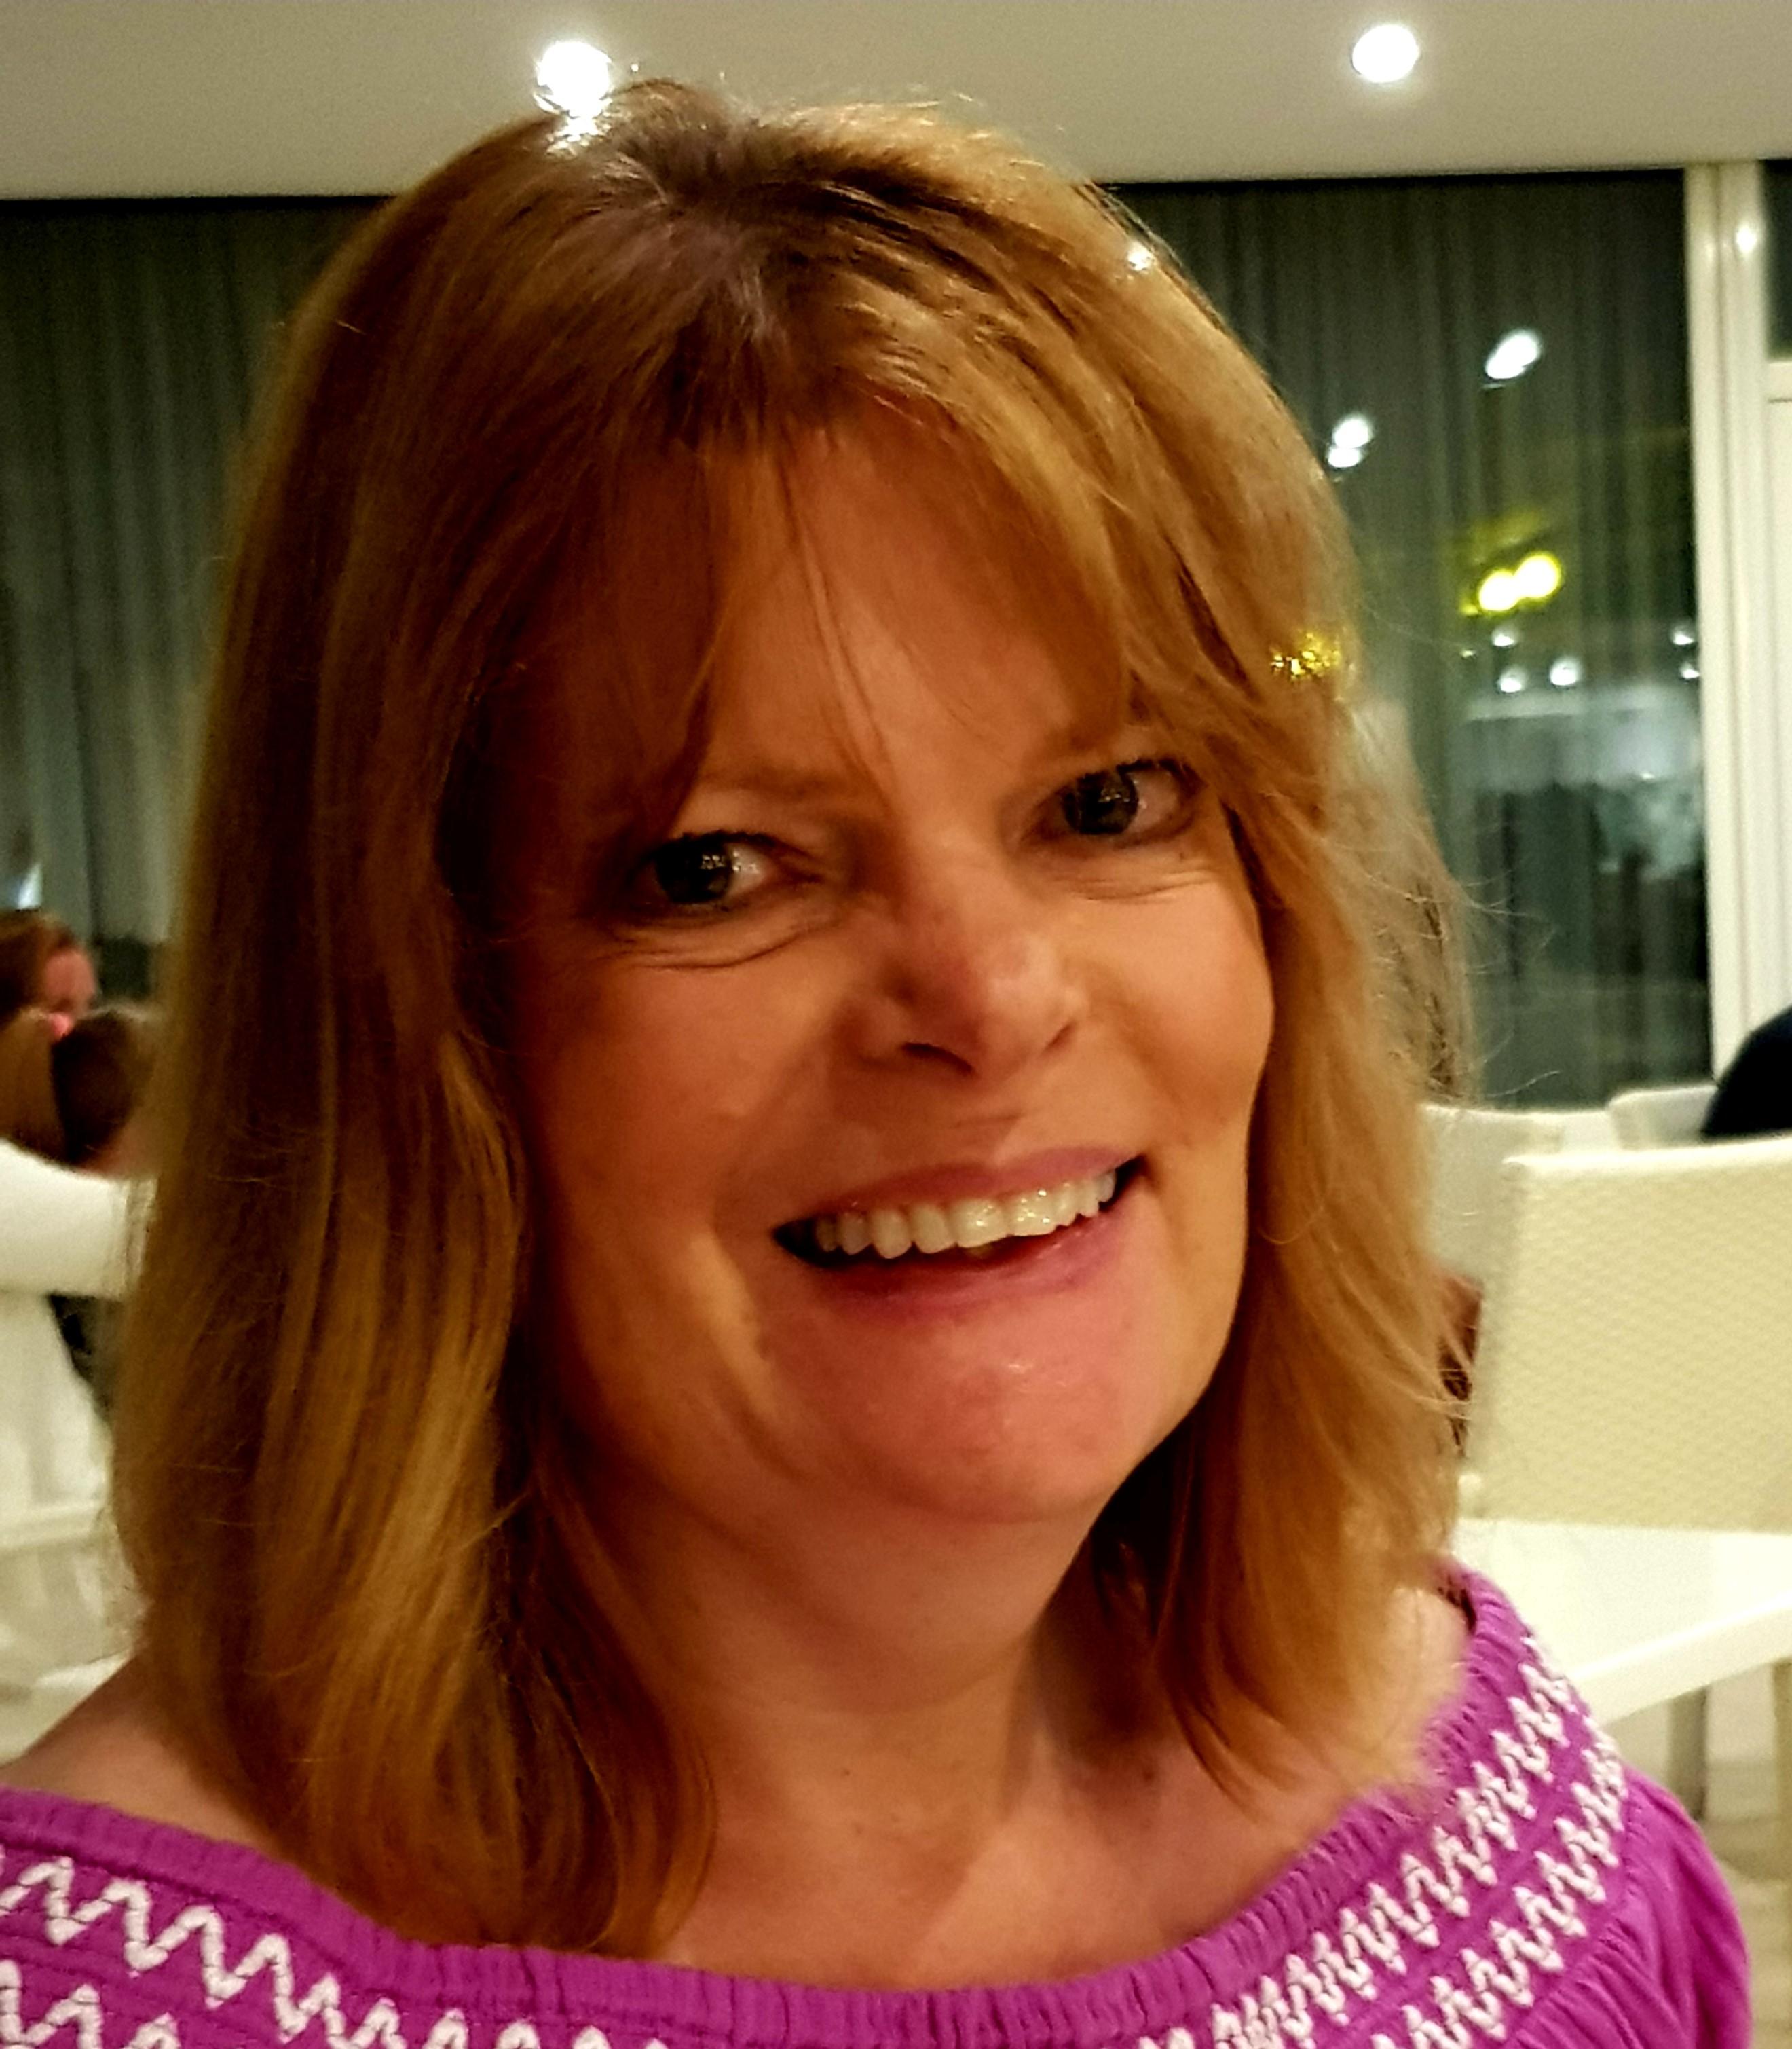 Nunudes Co Uk Alison: Sunningdale & West Byfleet